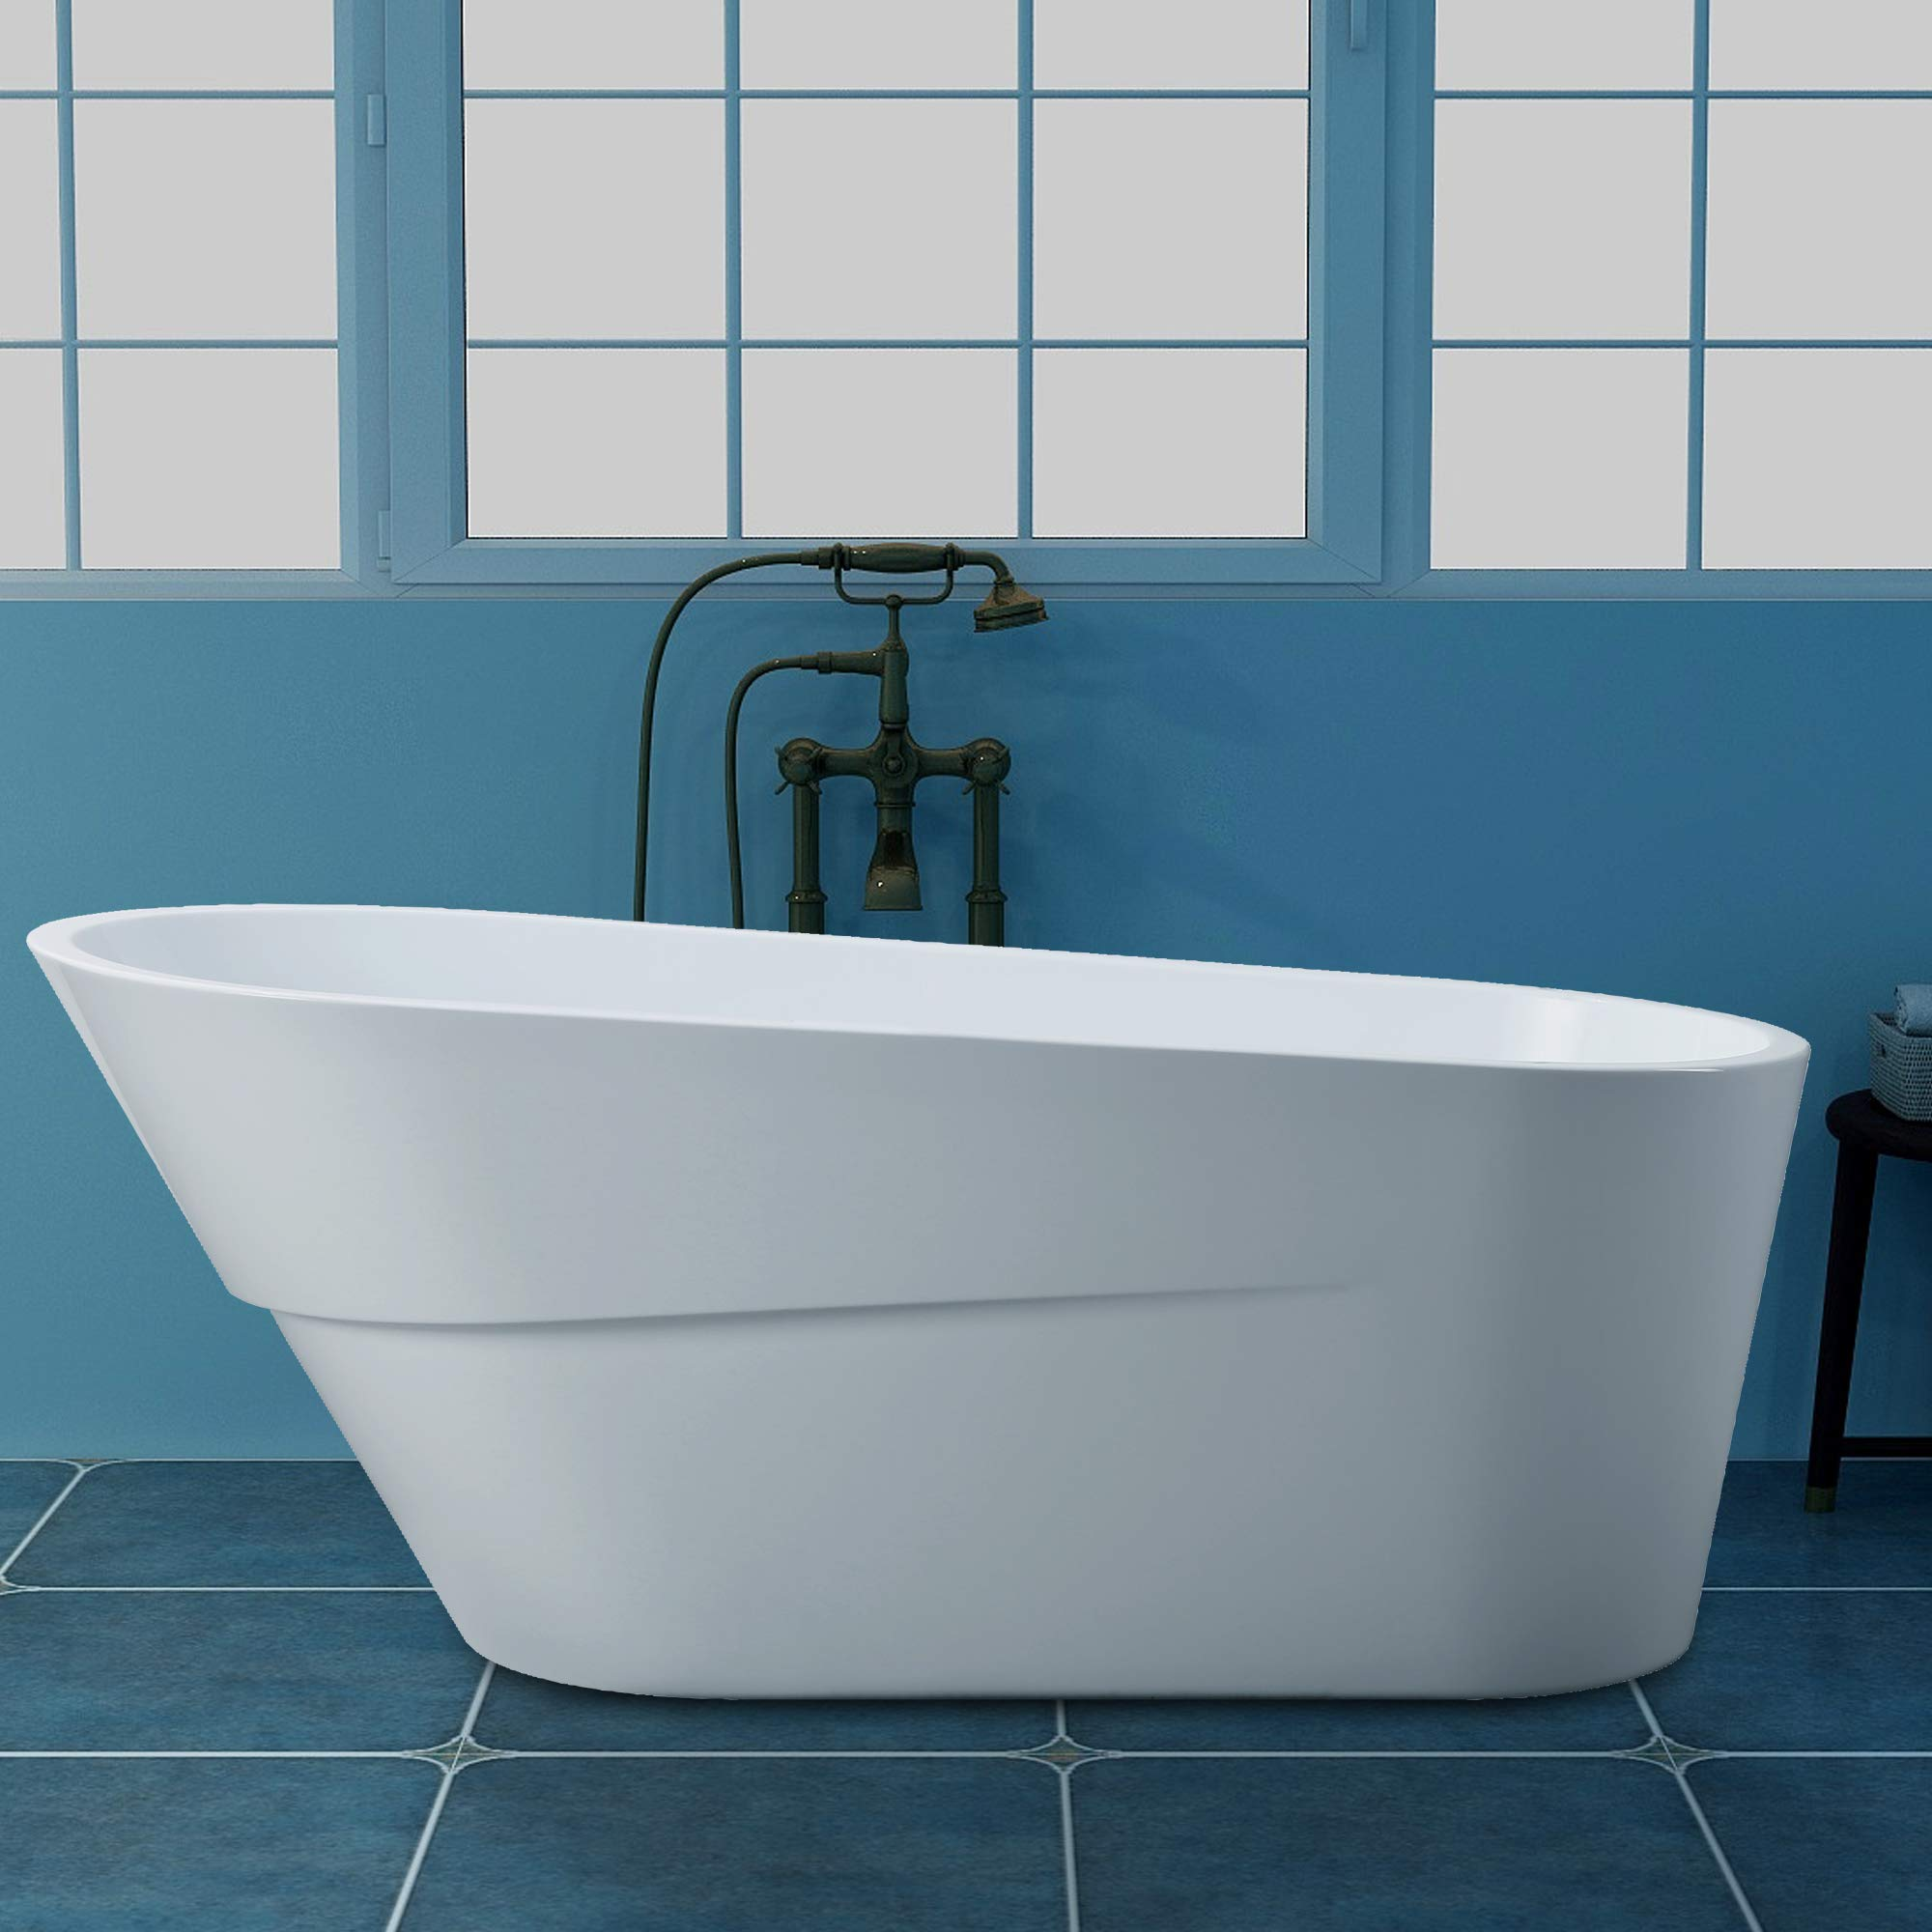 Vanity Art 67 inch Freestanding Acrylic Bathtub | Modern ...